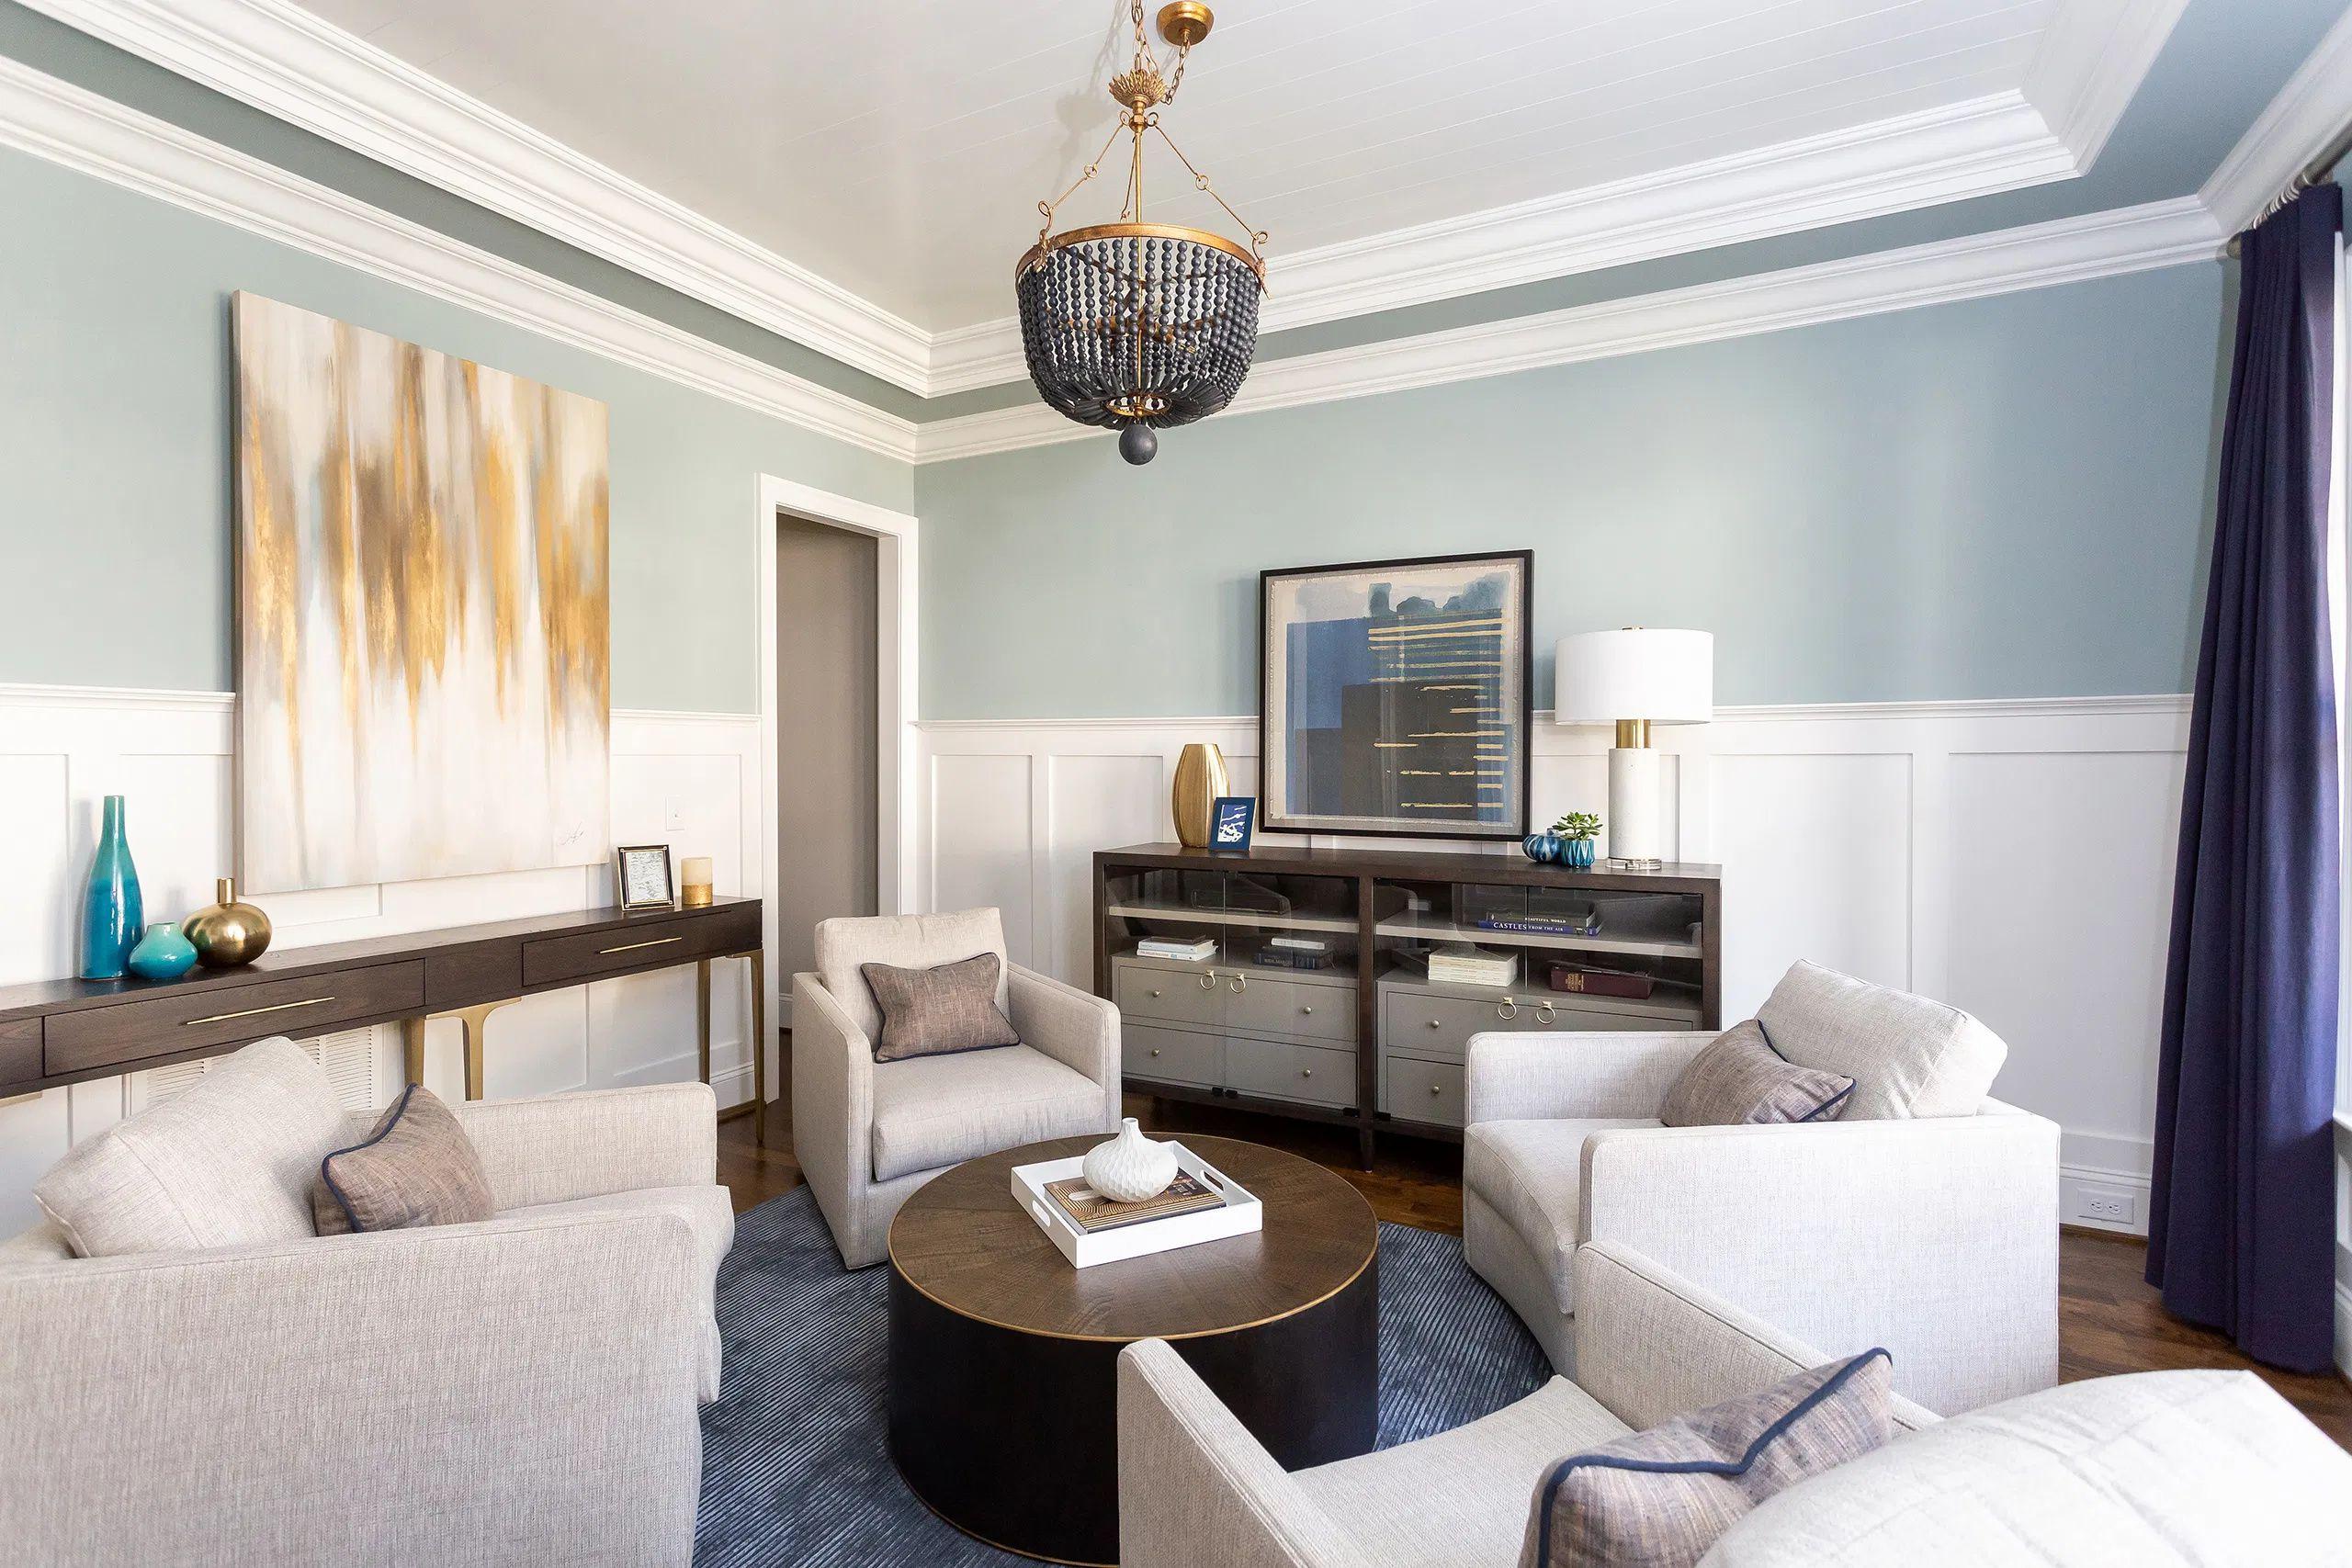 The Modern Parlor Formal Living Room Design In 2021 Formal Living Room Designs Formal Living Rooms Living Room Designs Sample living room designs